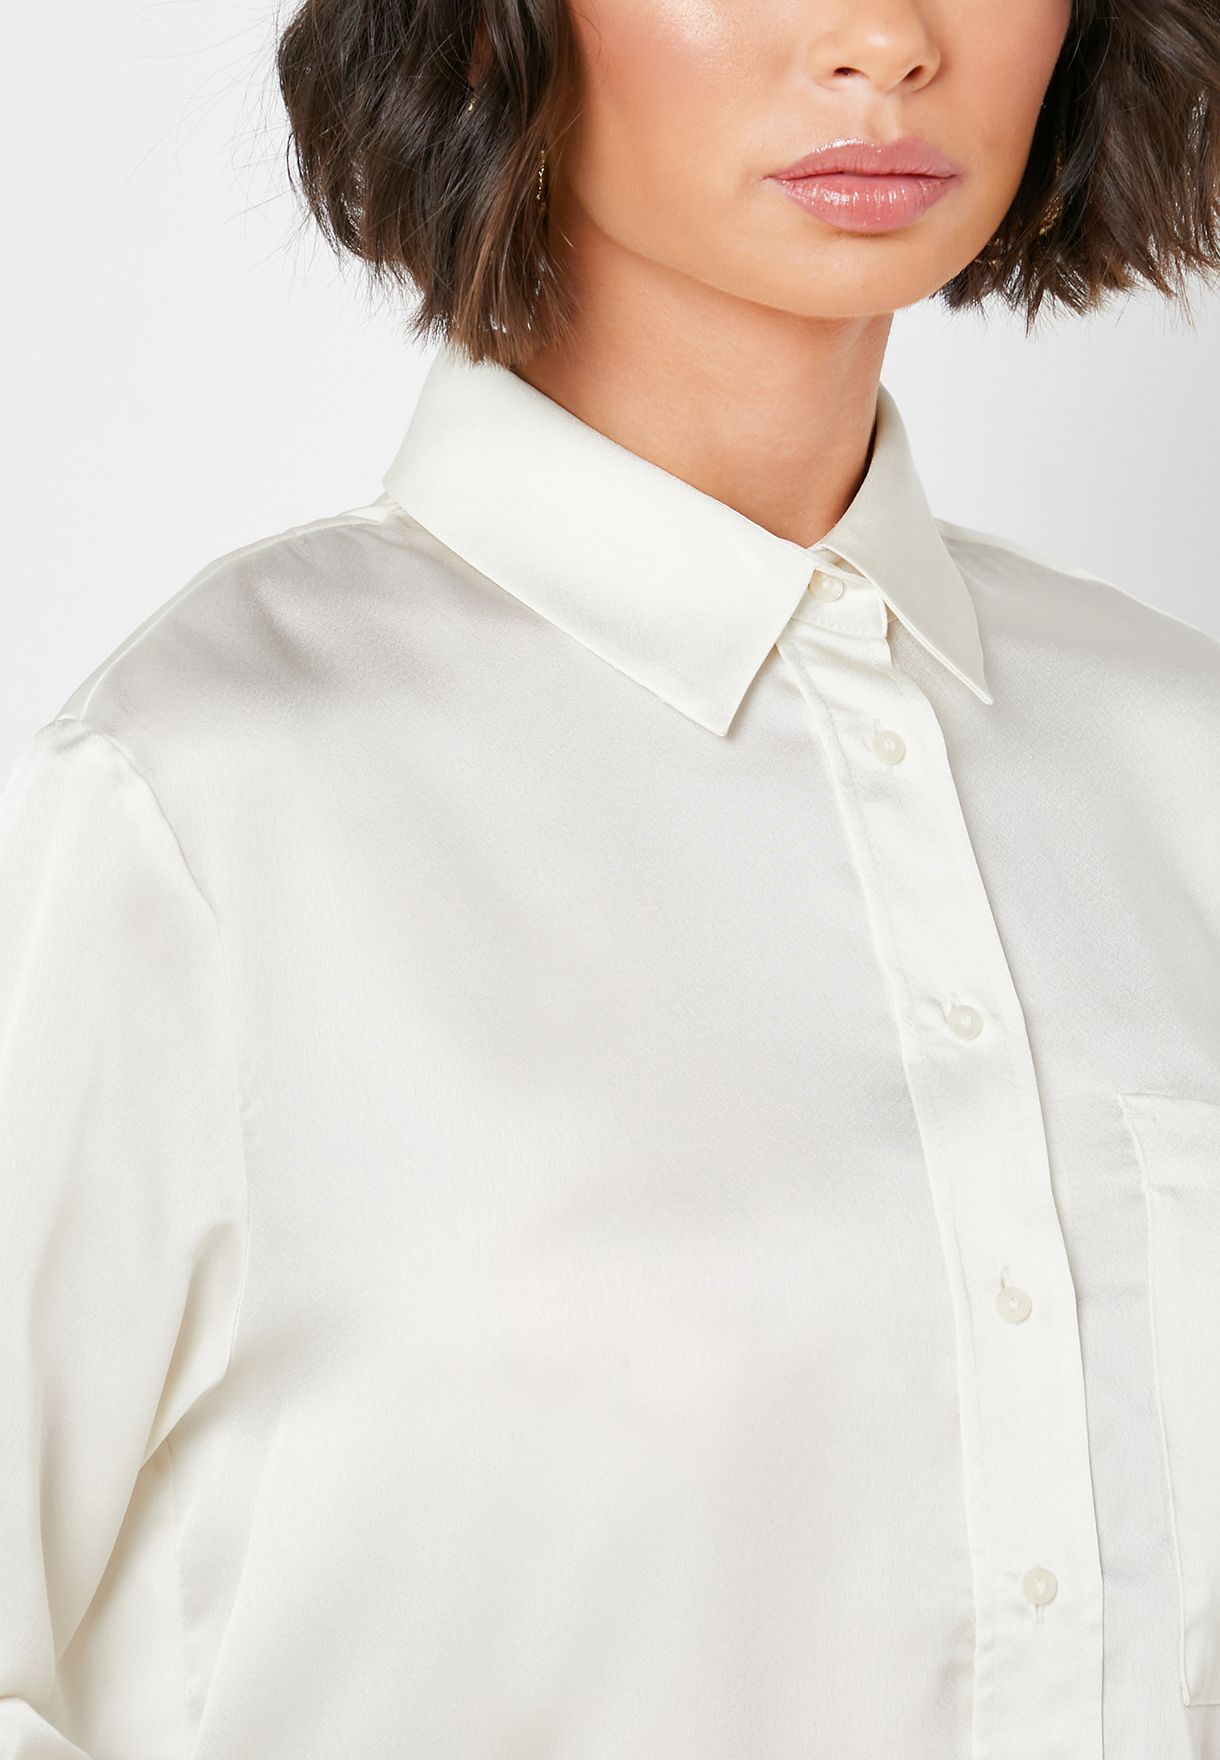 Tailoring Shirt